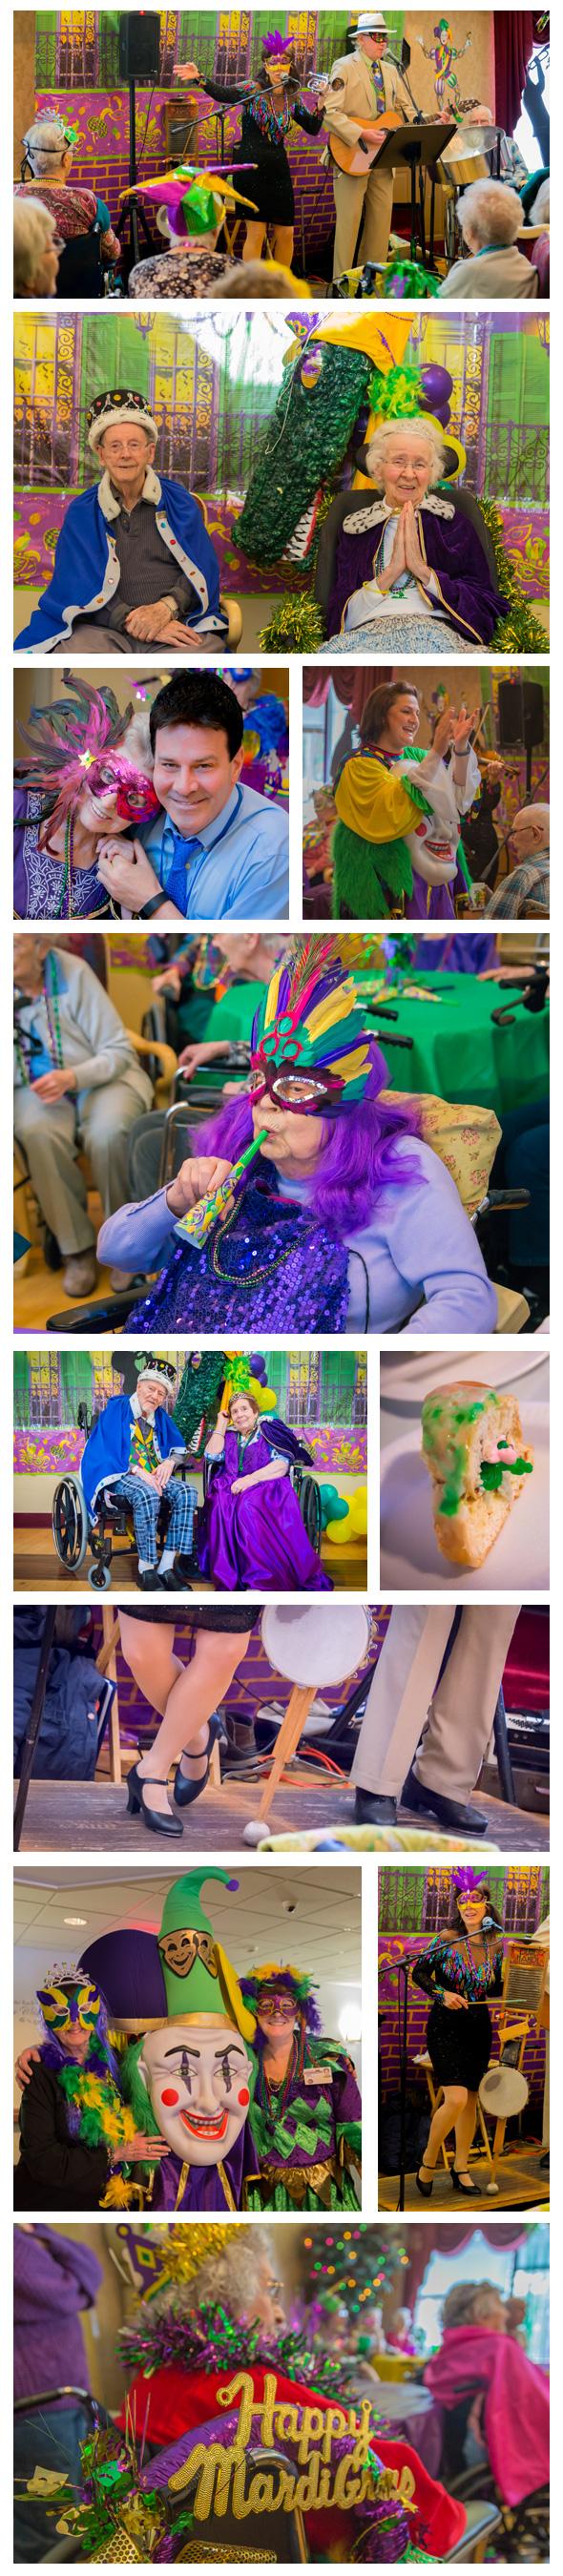 Photos of Mardi Gras festivities